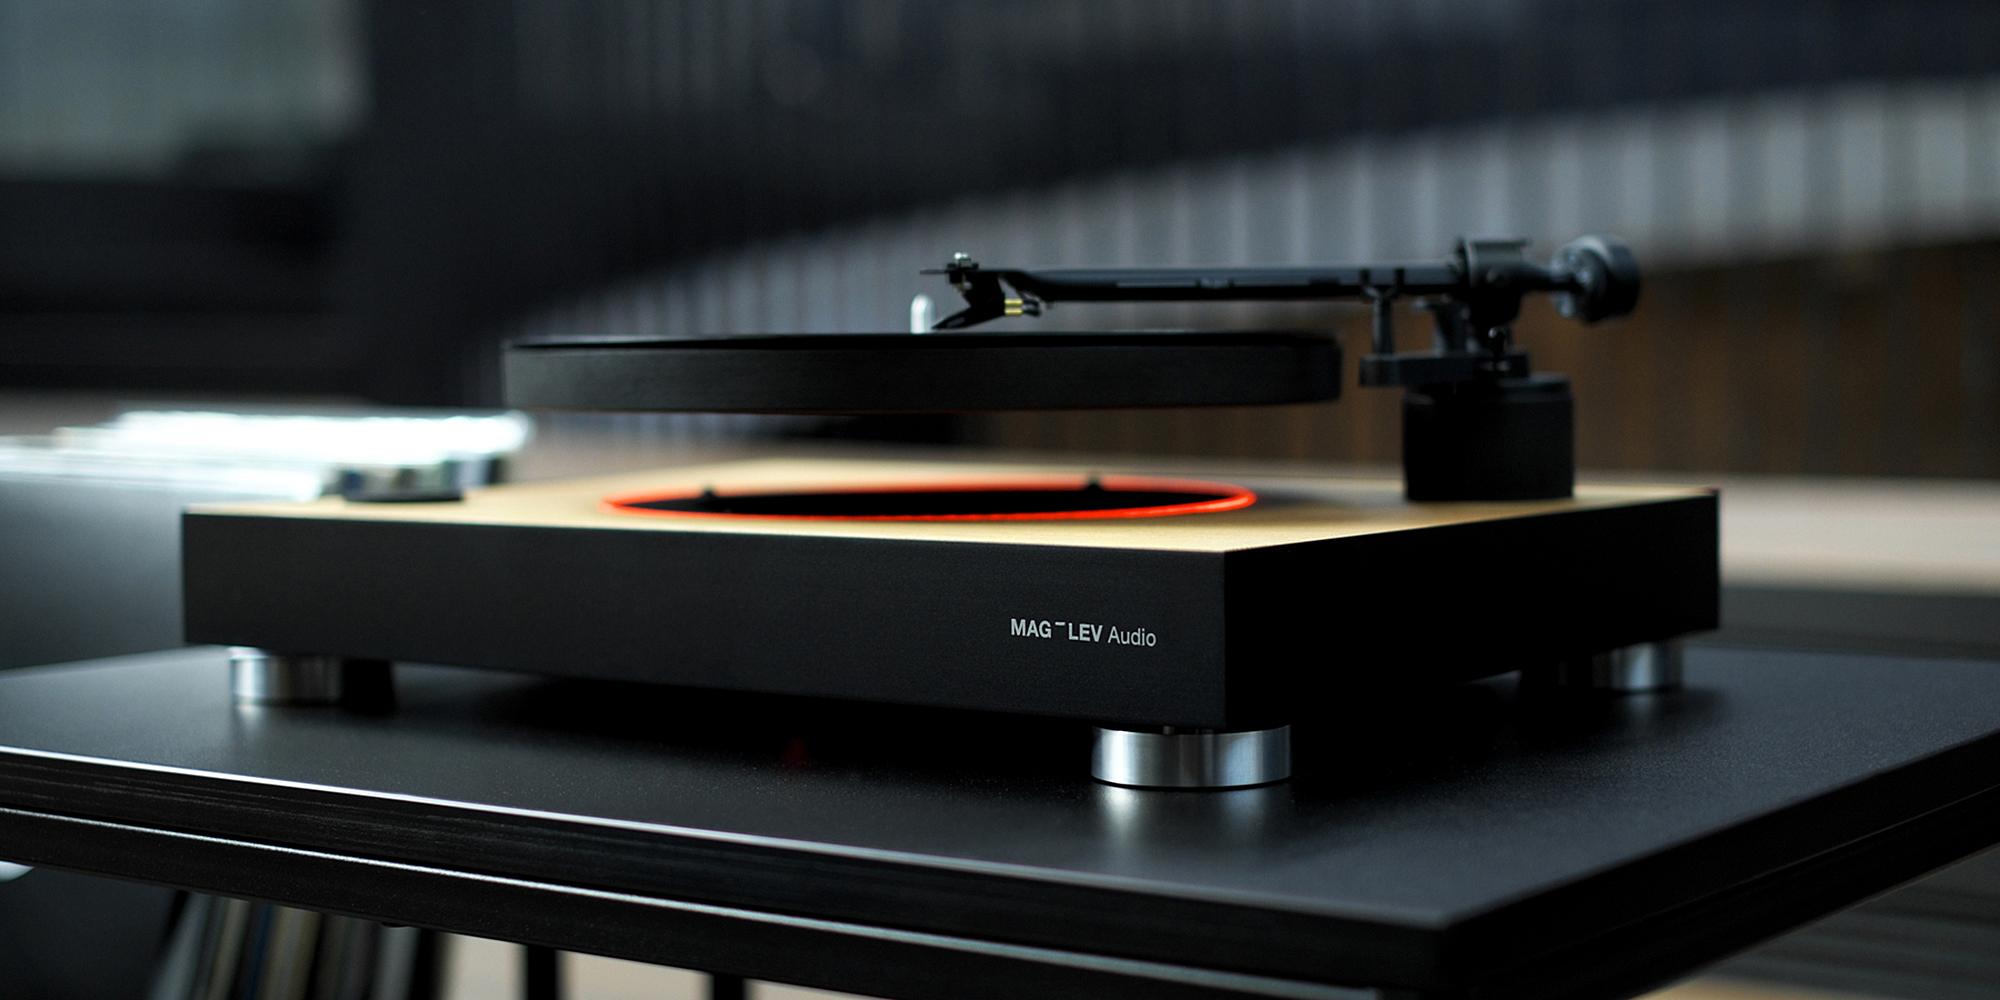 mag-lev-audio-floating-turntable-designboom-header1